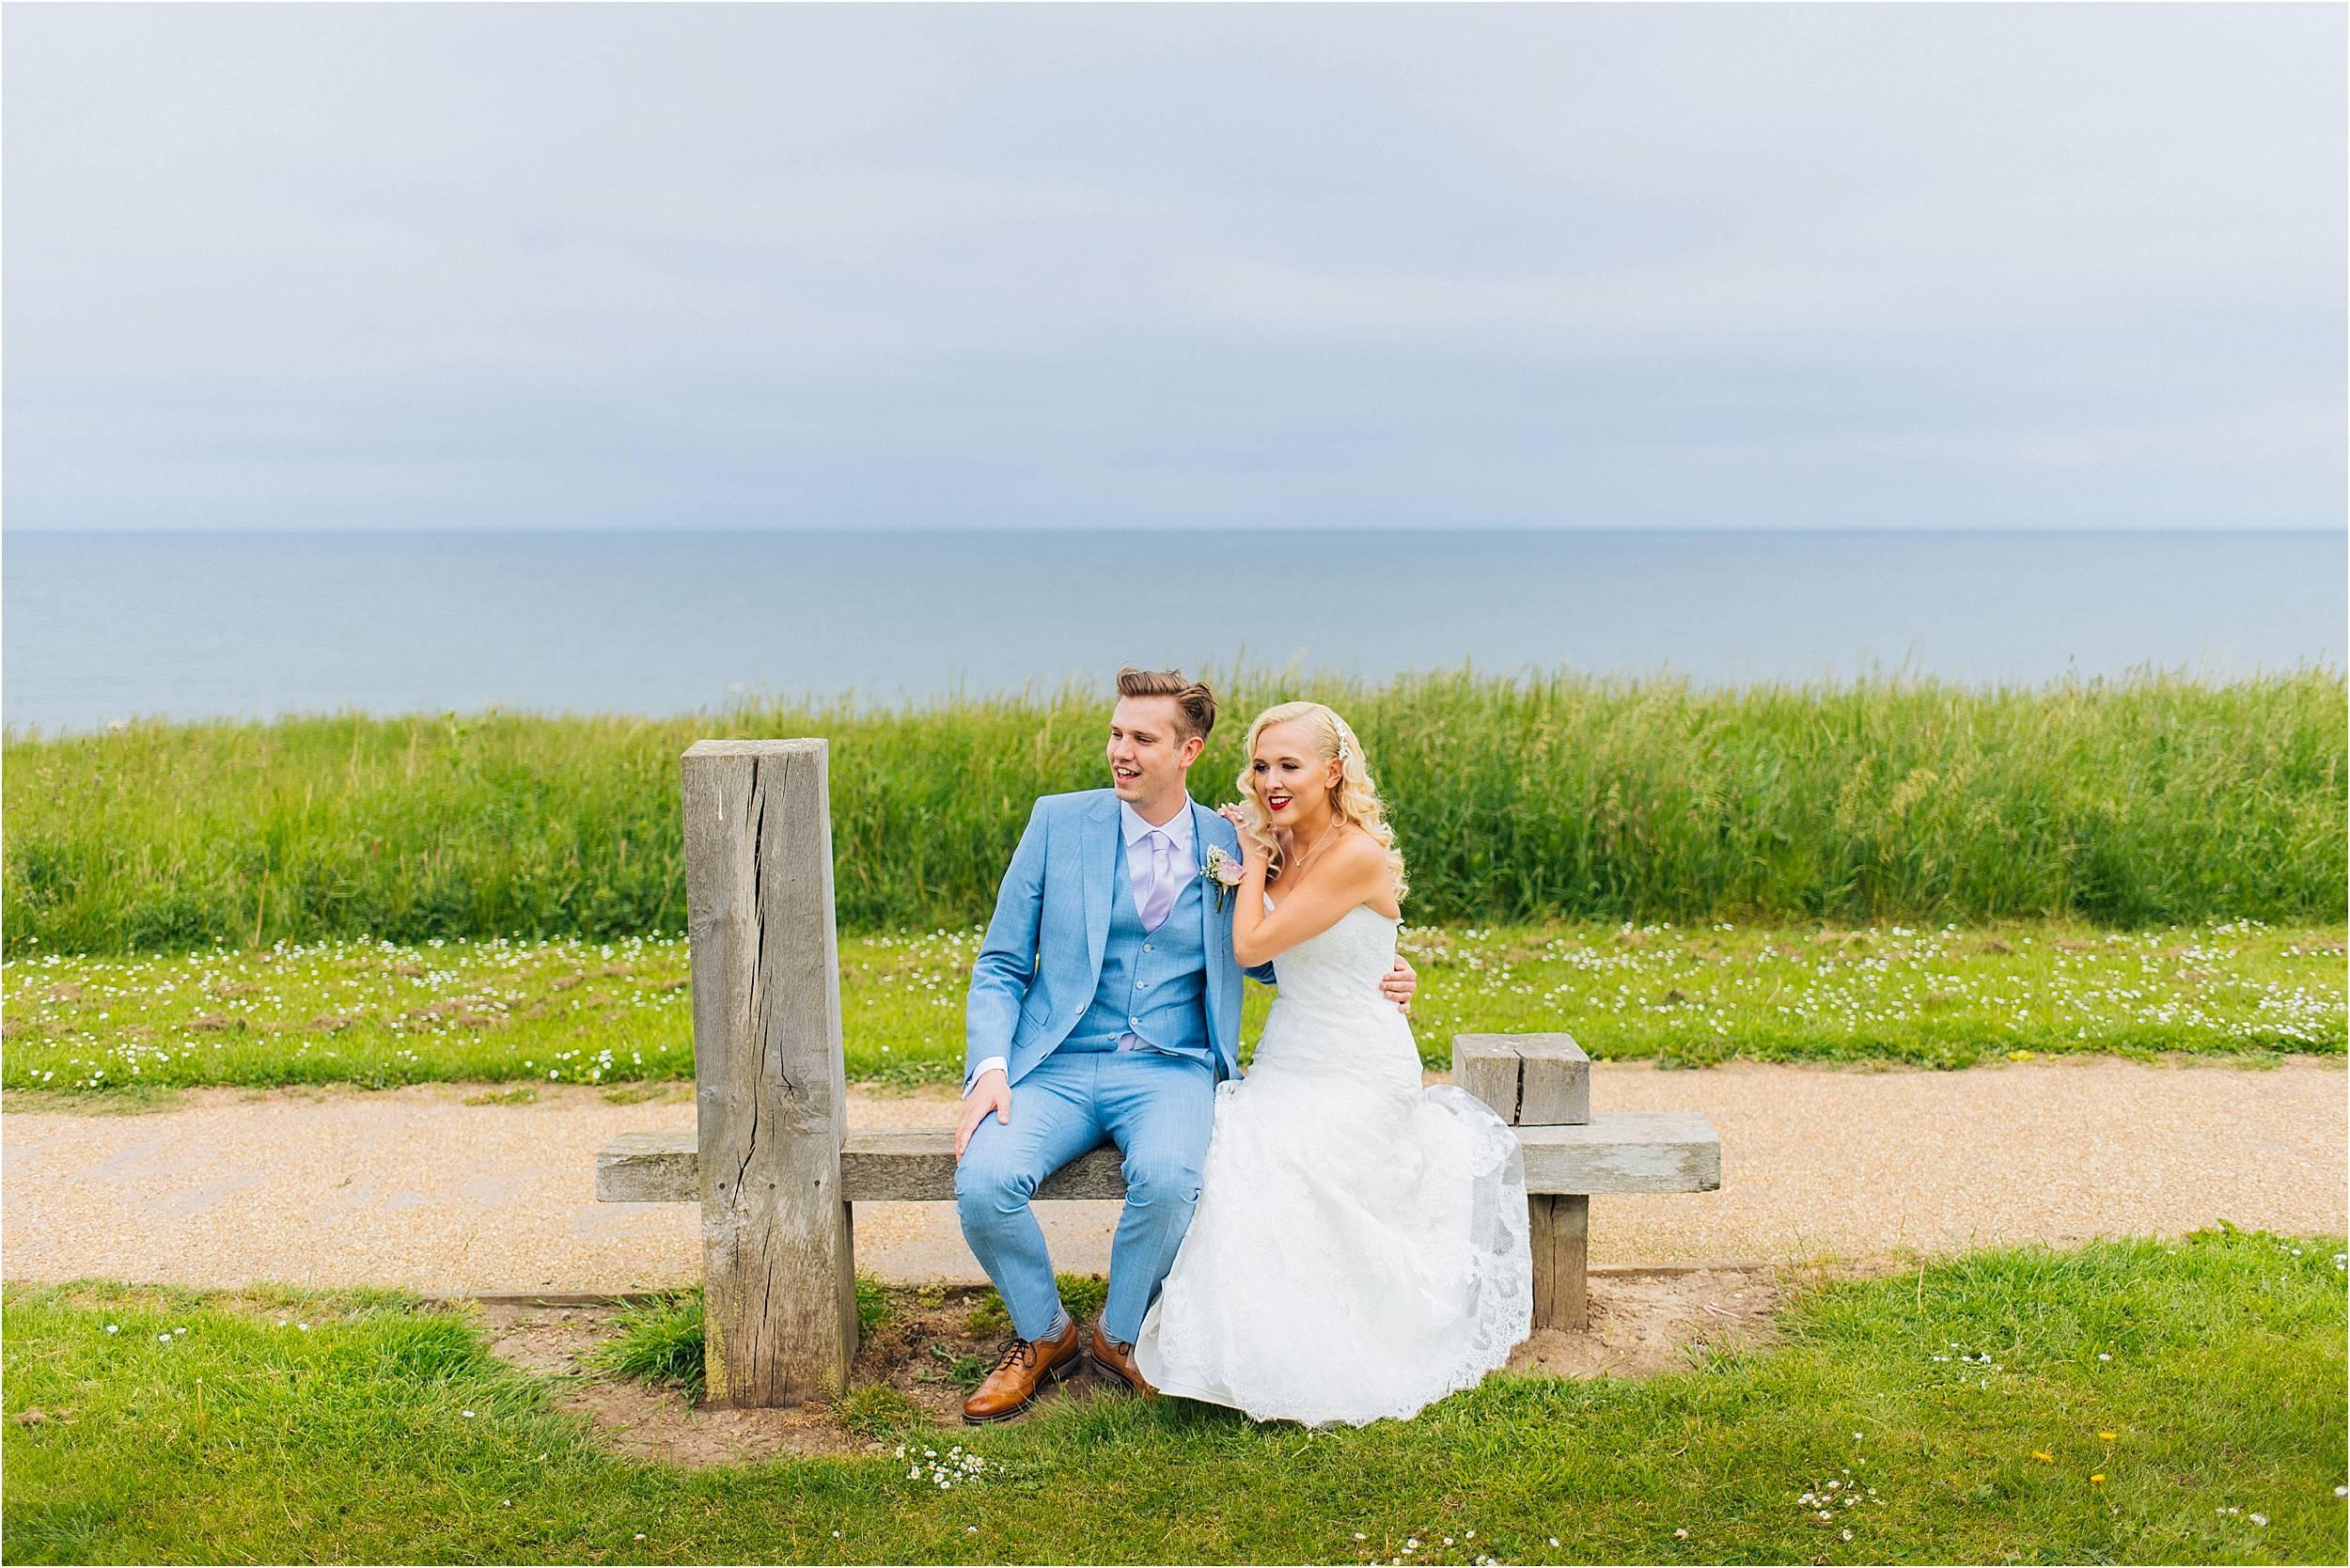 Seaham Hall Wedding Photography_0043.jpg